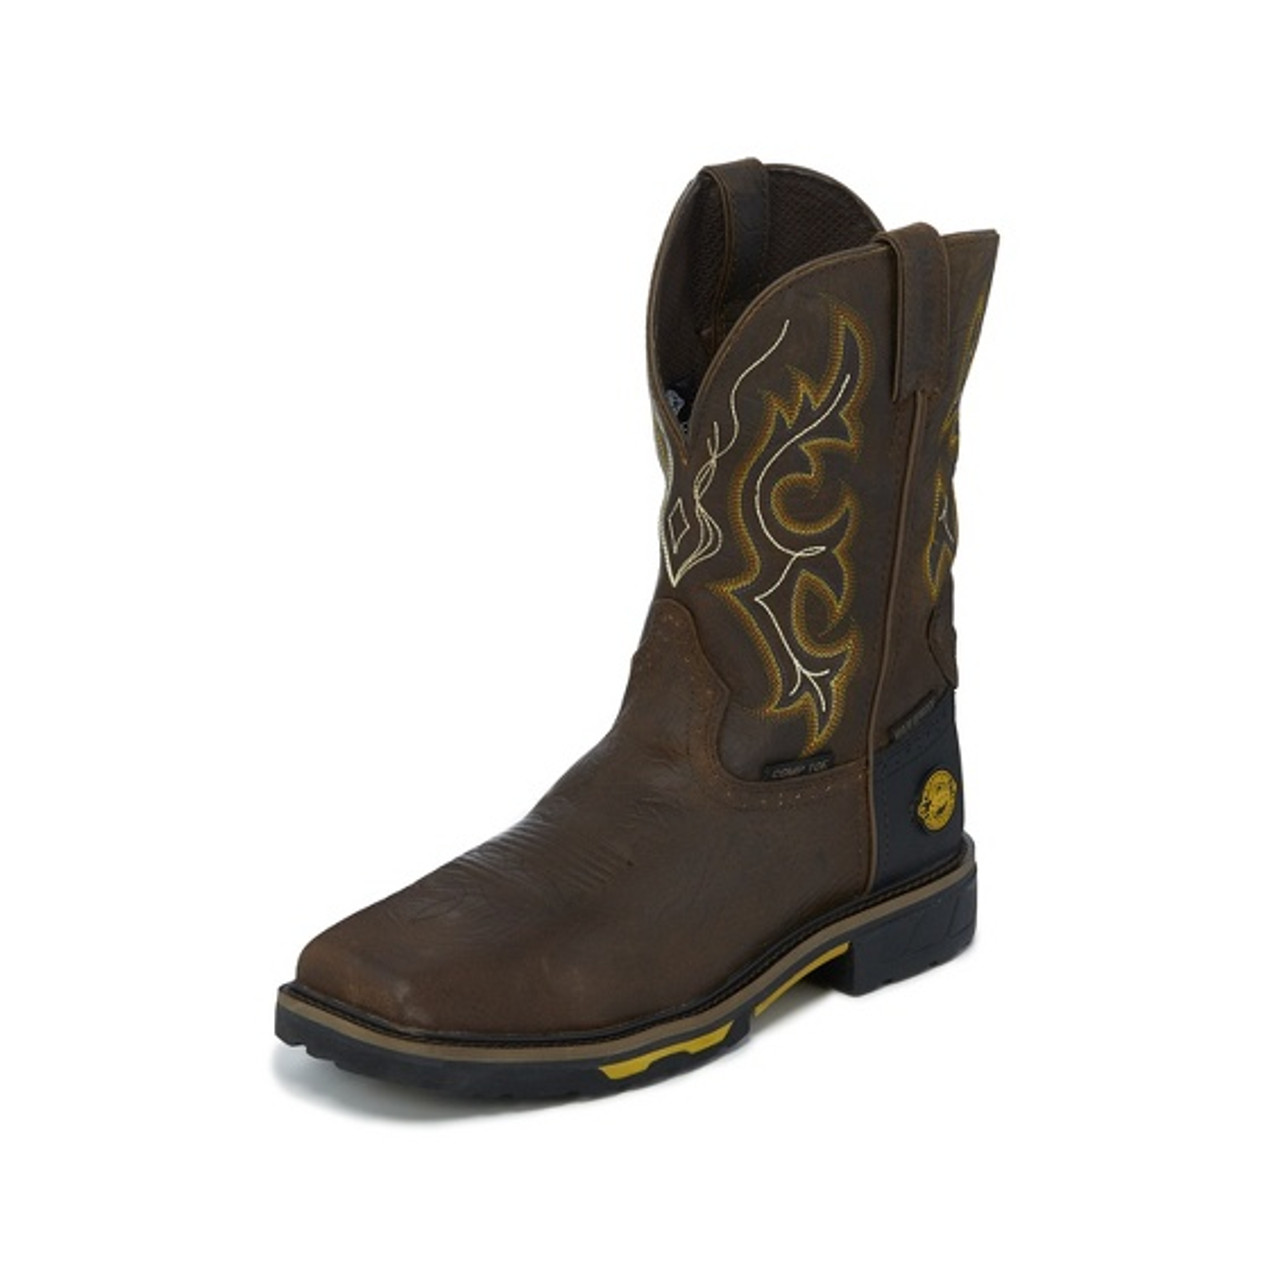 1b94760bbe7 Justin Men's Work Boots - Joist Rustic Waterproof Composite Toe